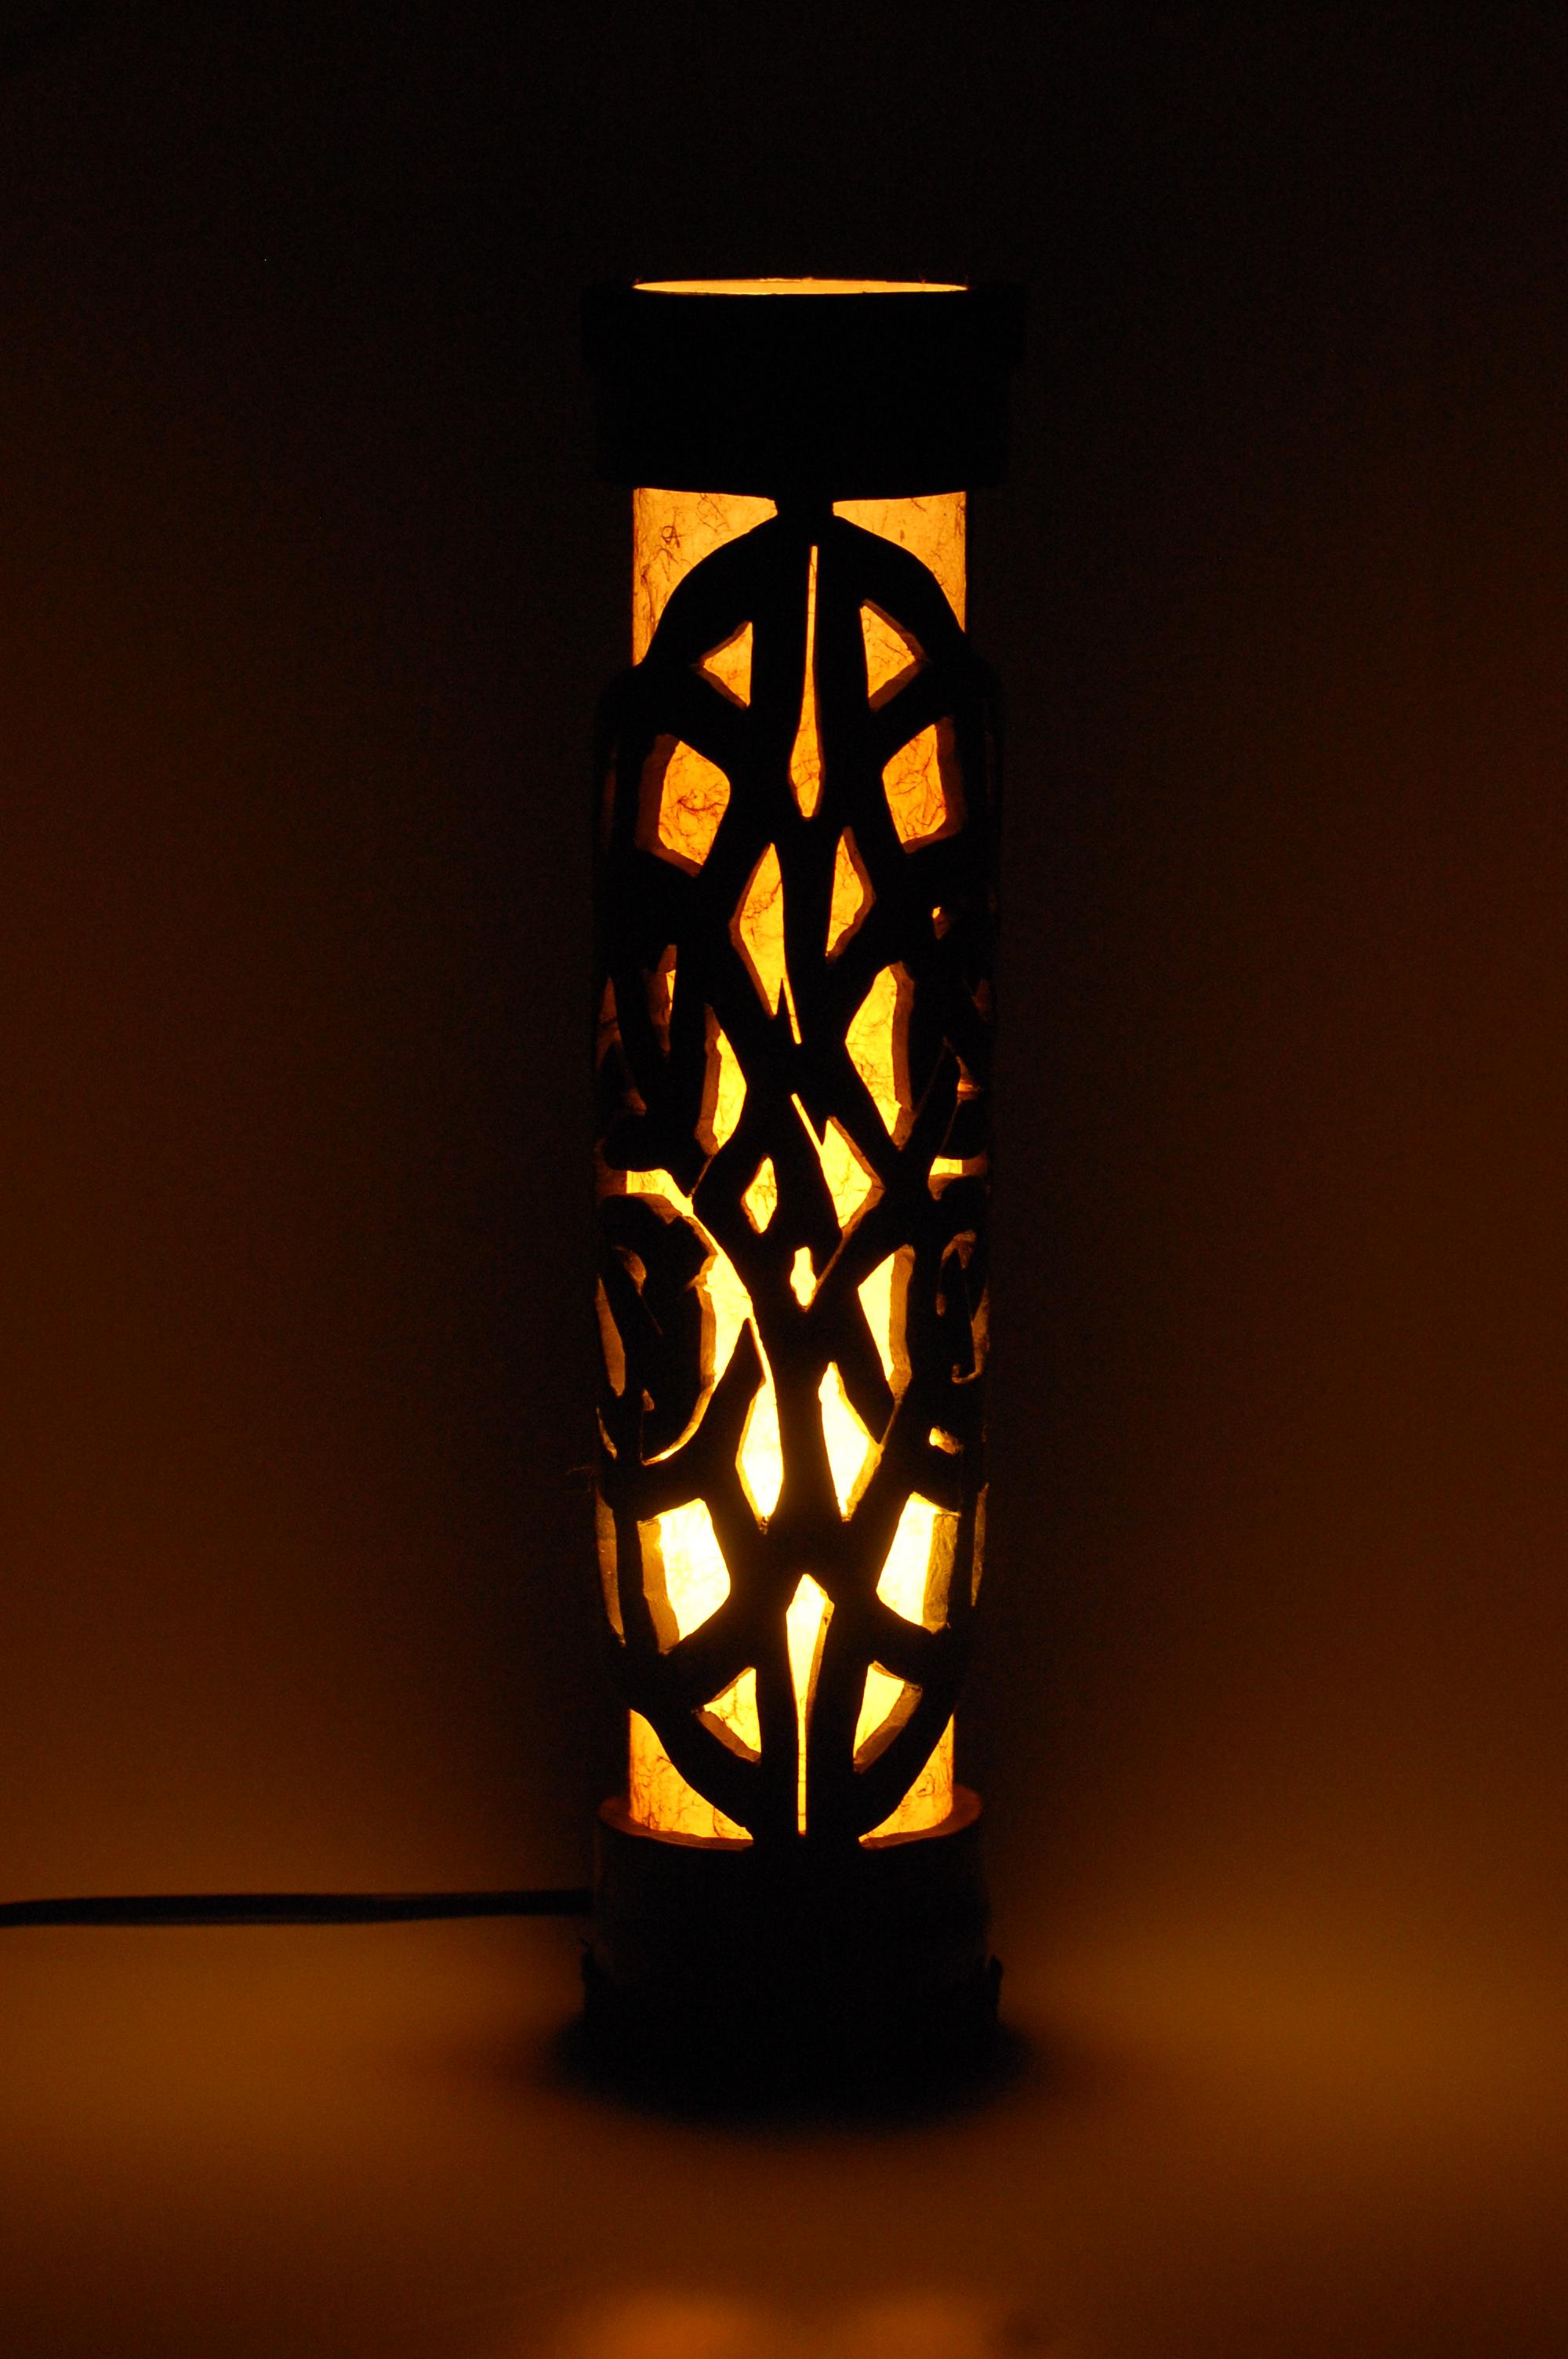 Bamboo Table Lamp 10 Reasons To Buy Warisan Lighting